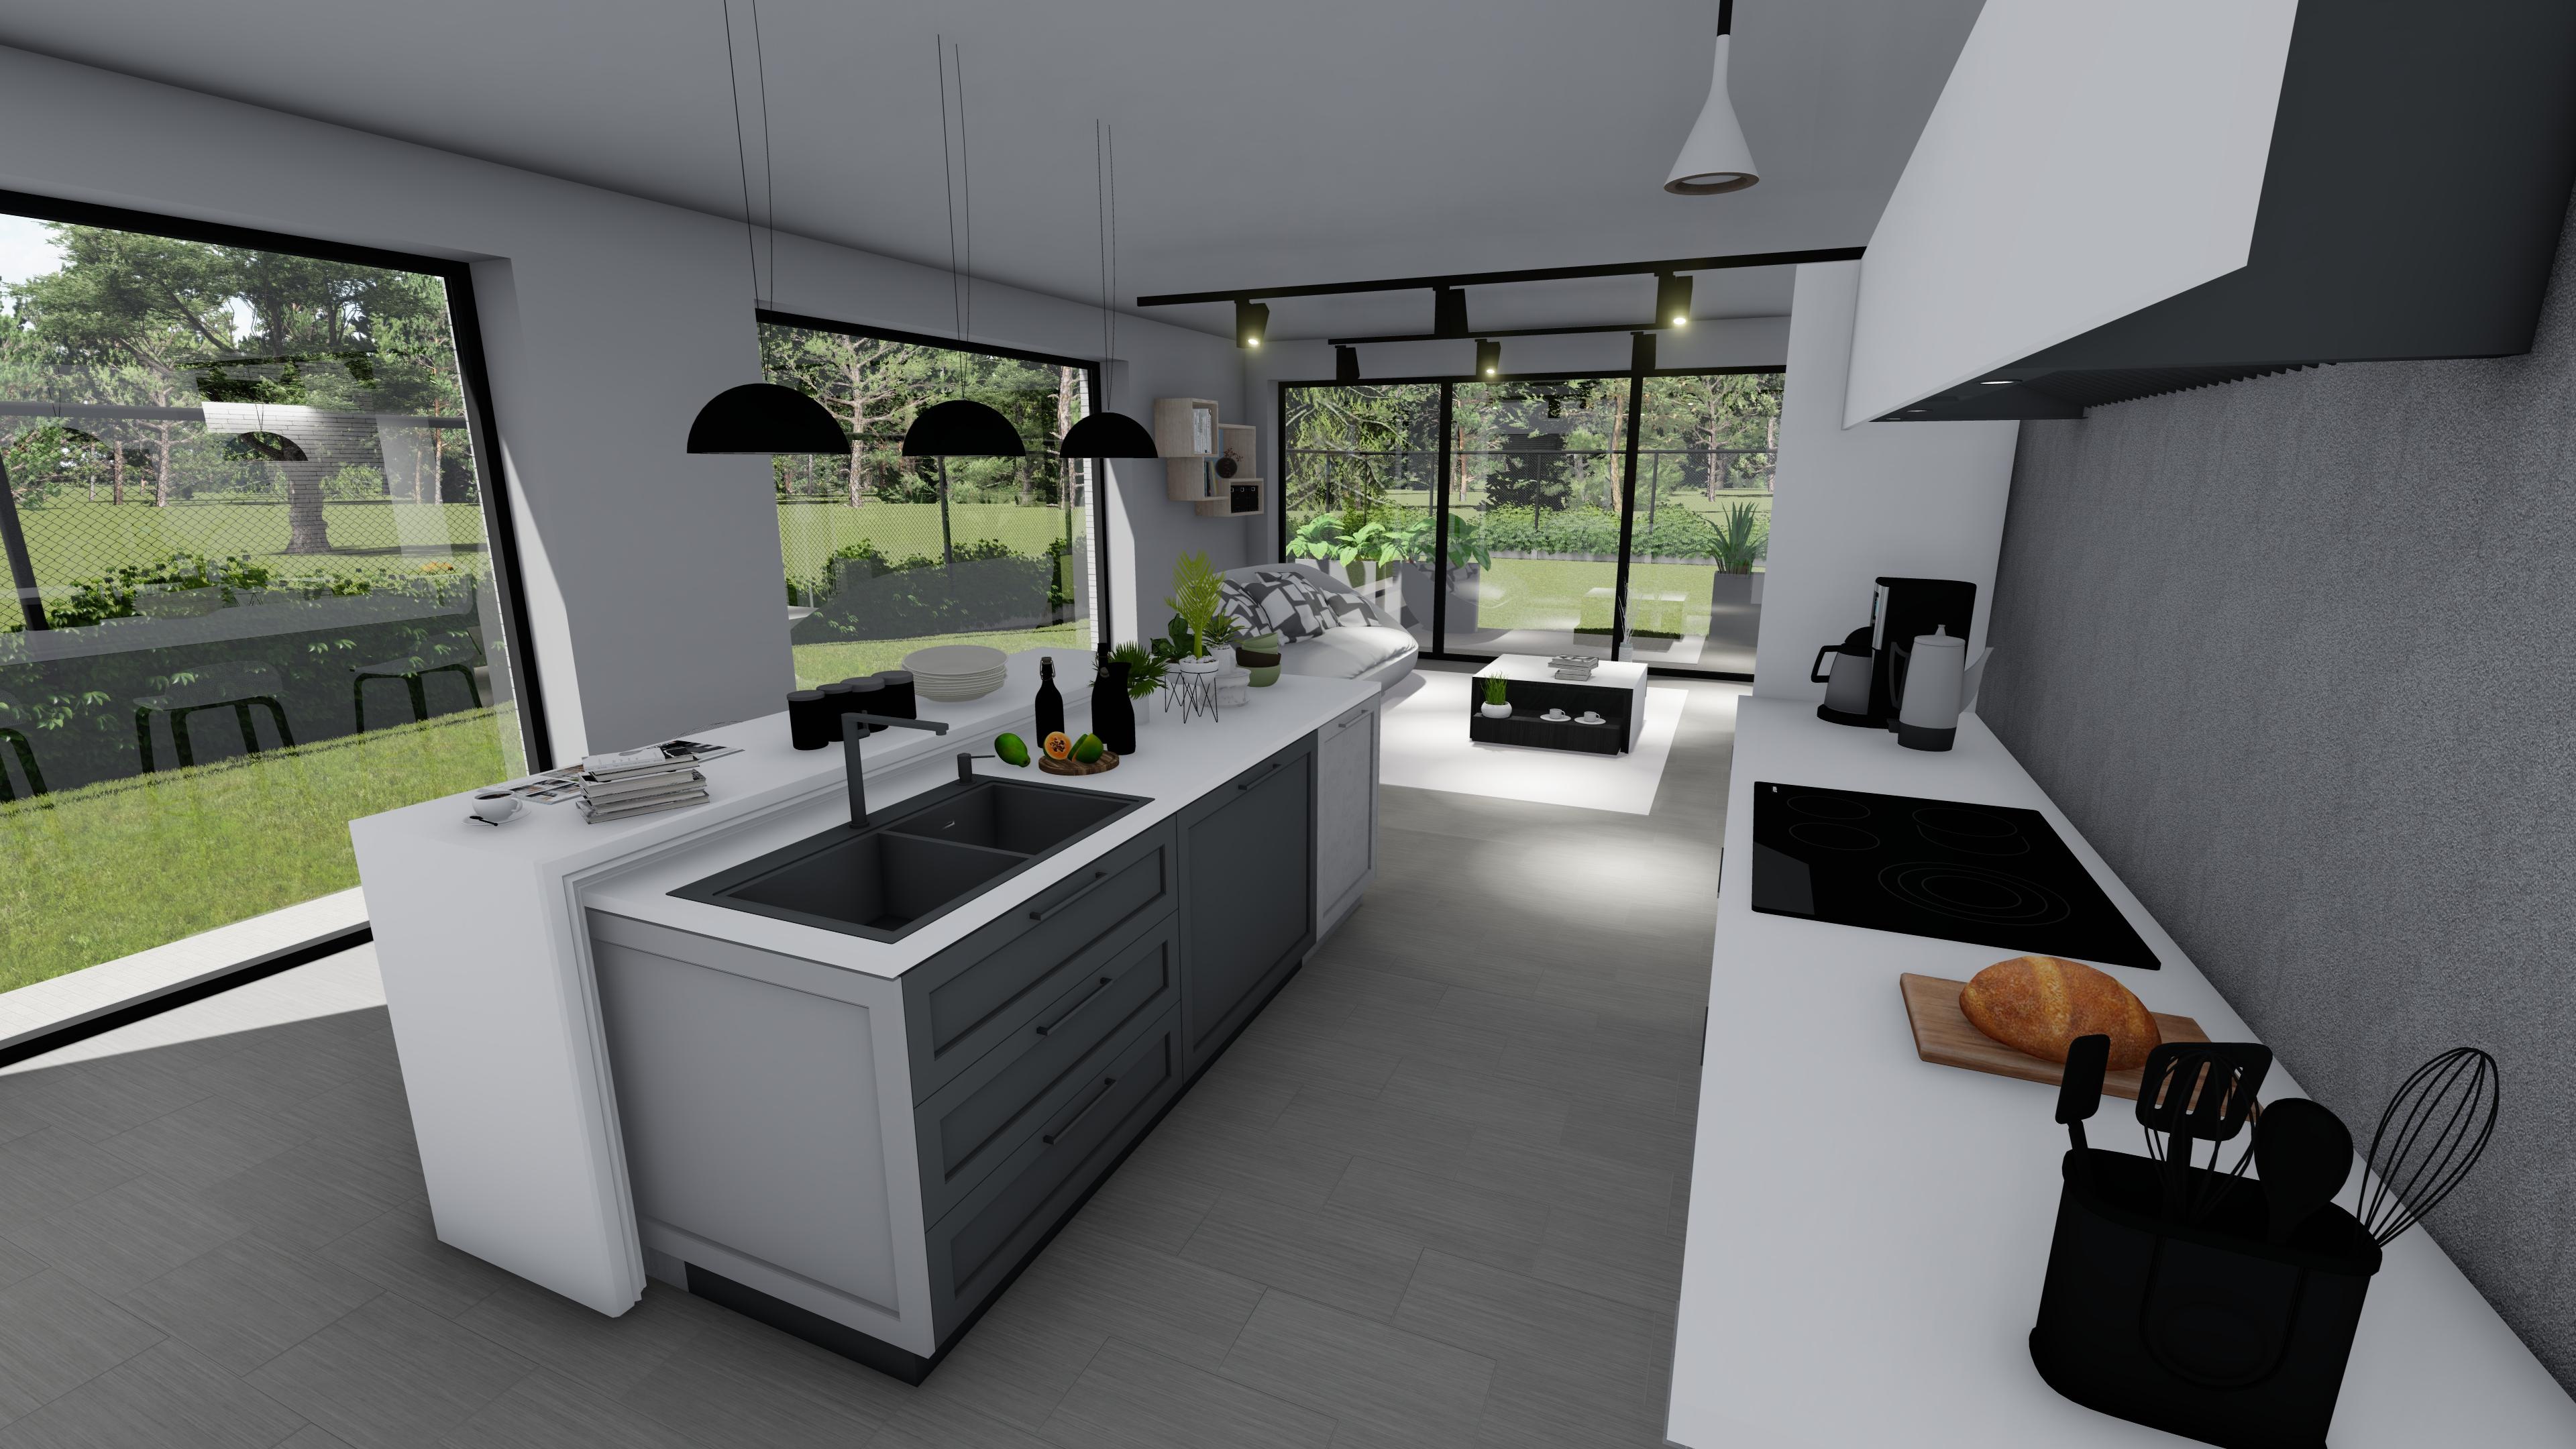 keuken_5 - Foto